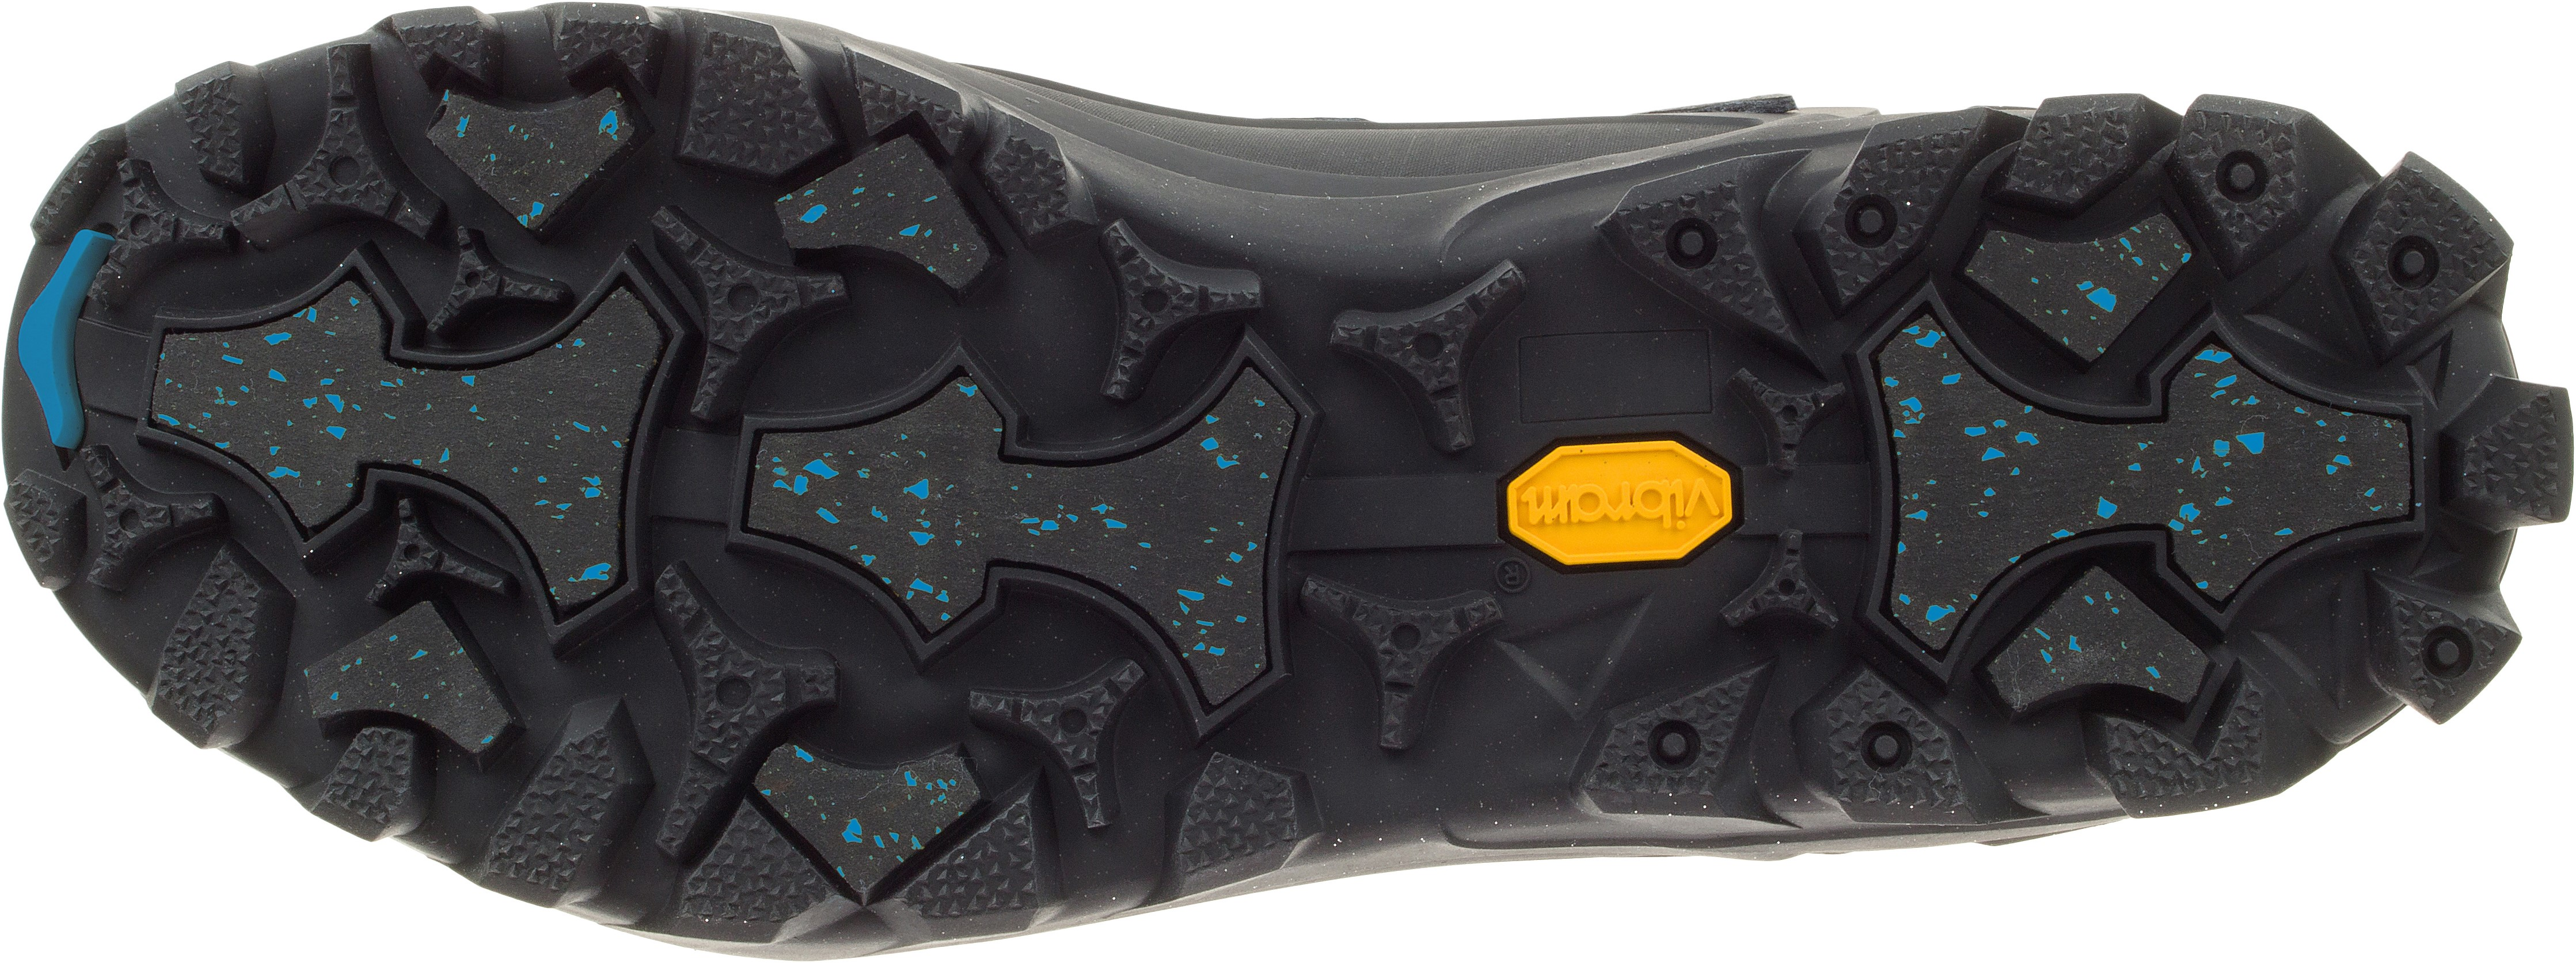 731ba8c27d74 What is Vibram Arctic Grip  - Englin s Fine Footwear